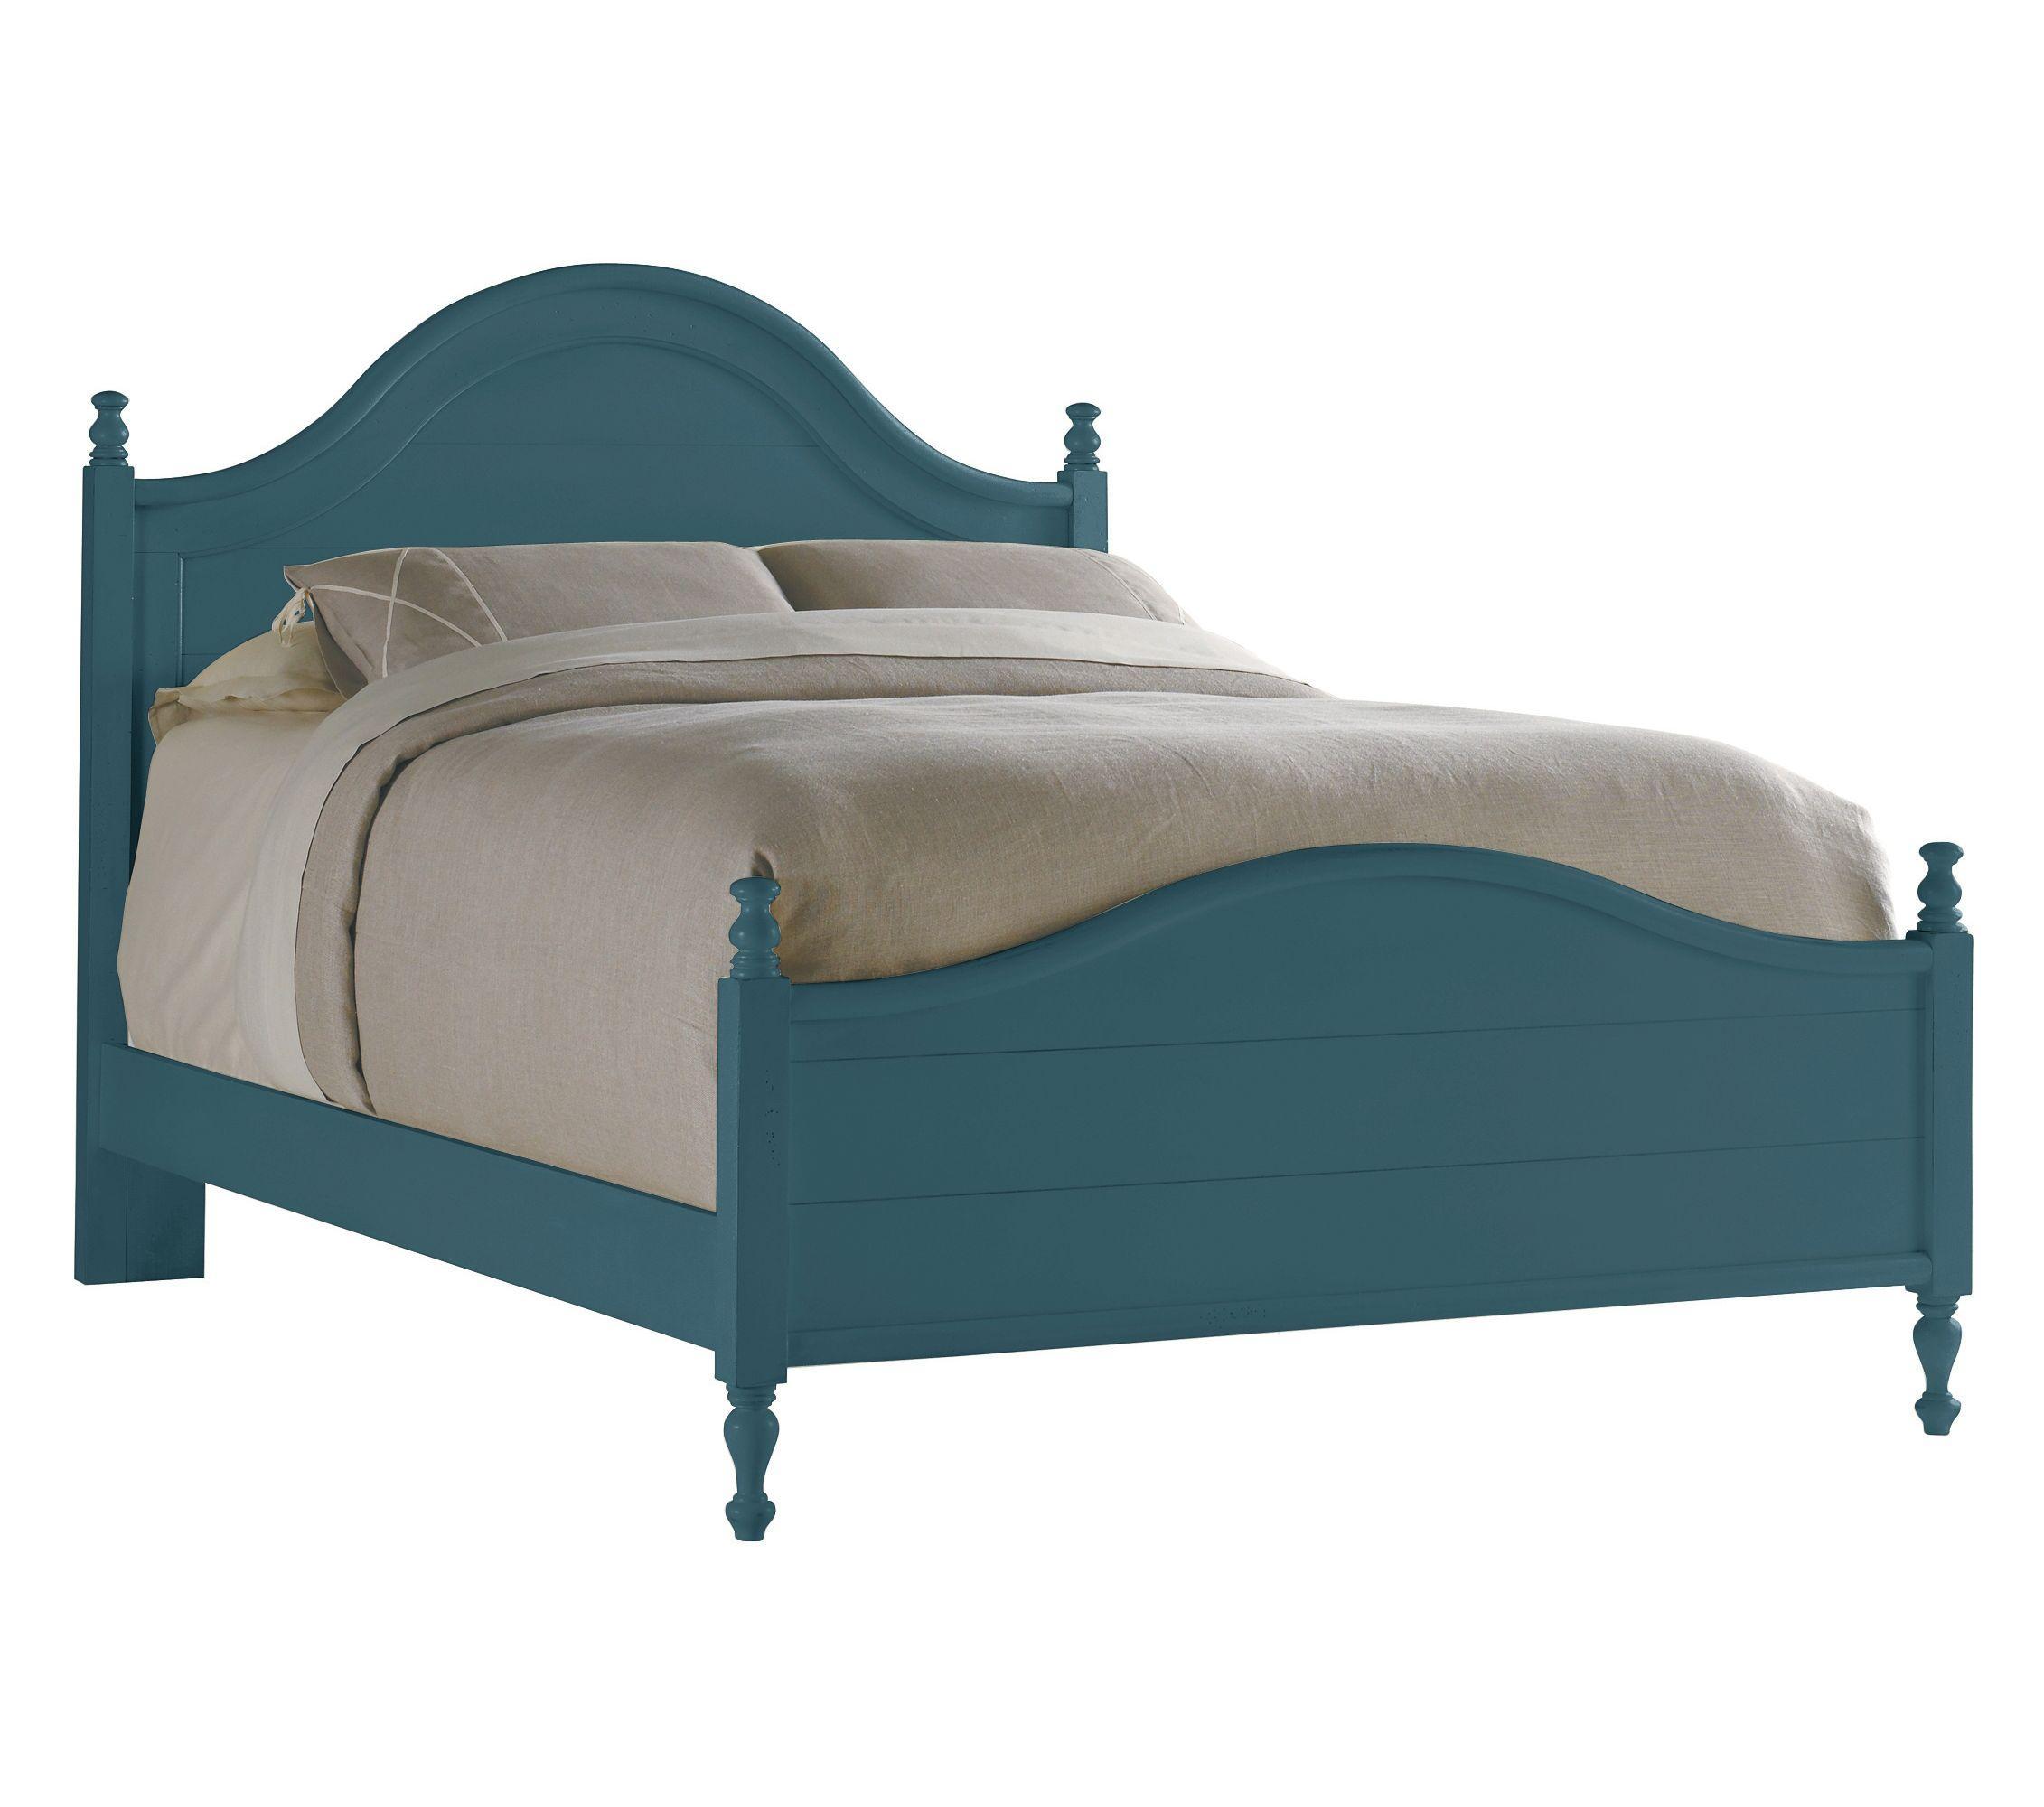 Stanley Furniture Coastal Living Retreat King Bungalow Bed - Item Number: 411-53-39